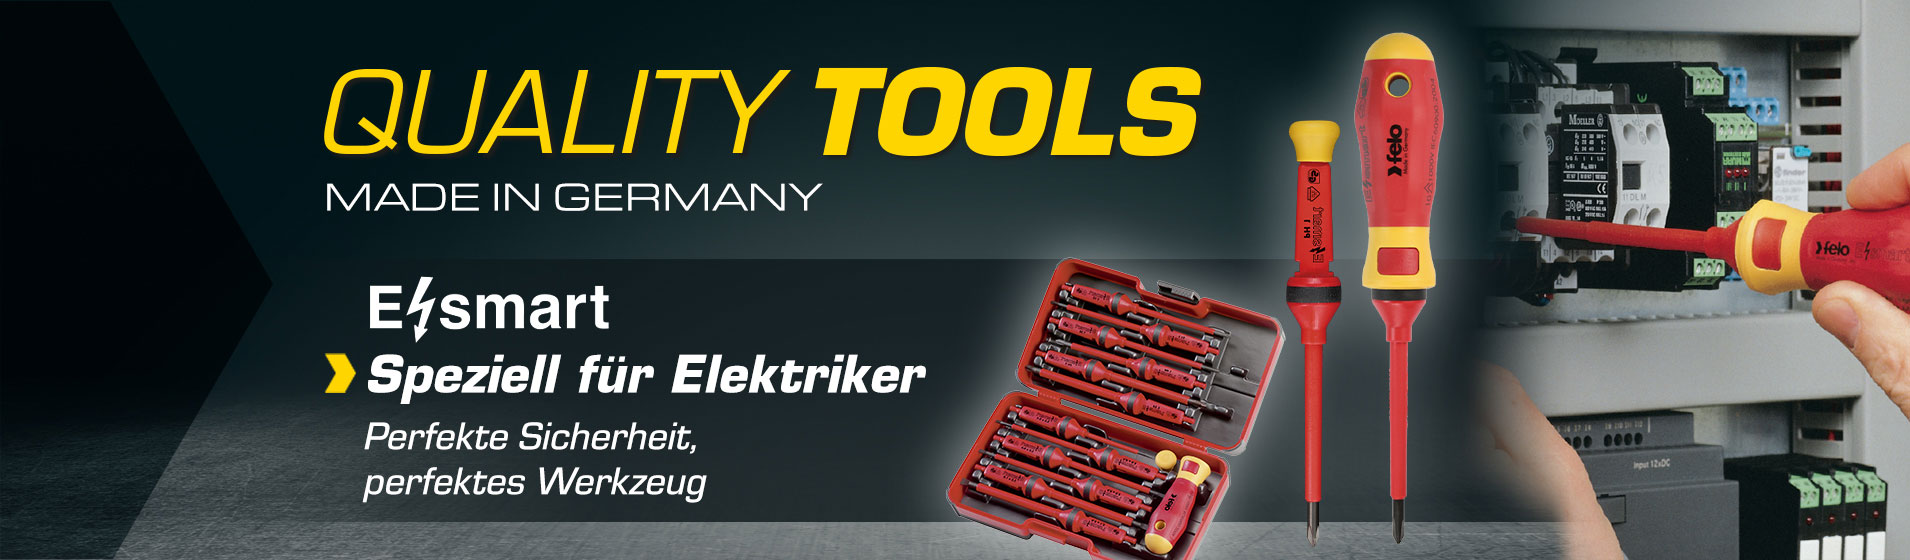 FELO E-SMART - Perfekte Sicherheit, perfektes Werkzeug speziell für Elektriker